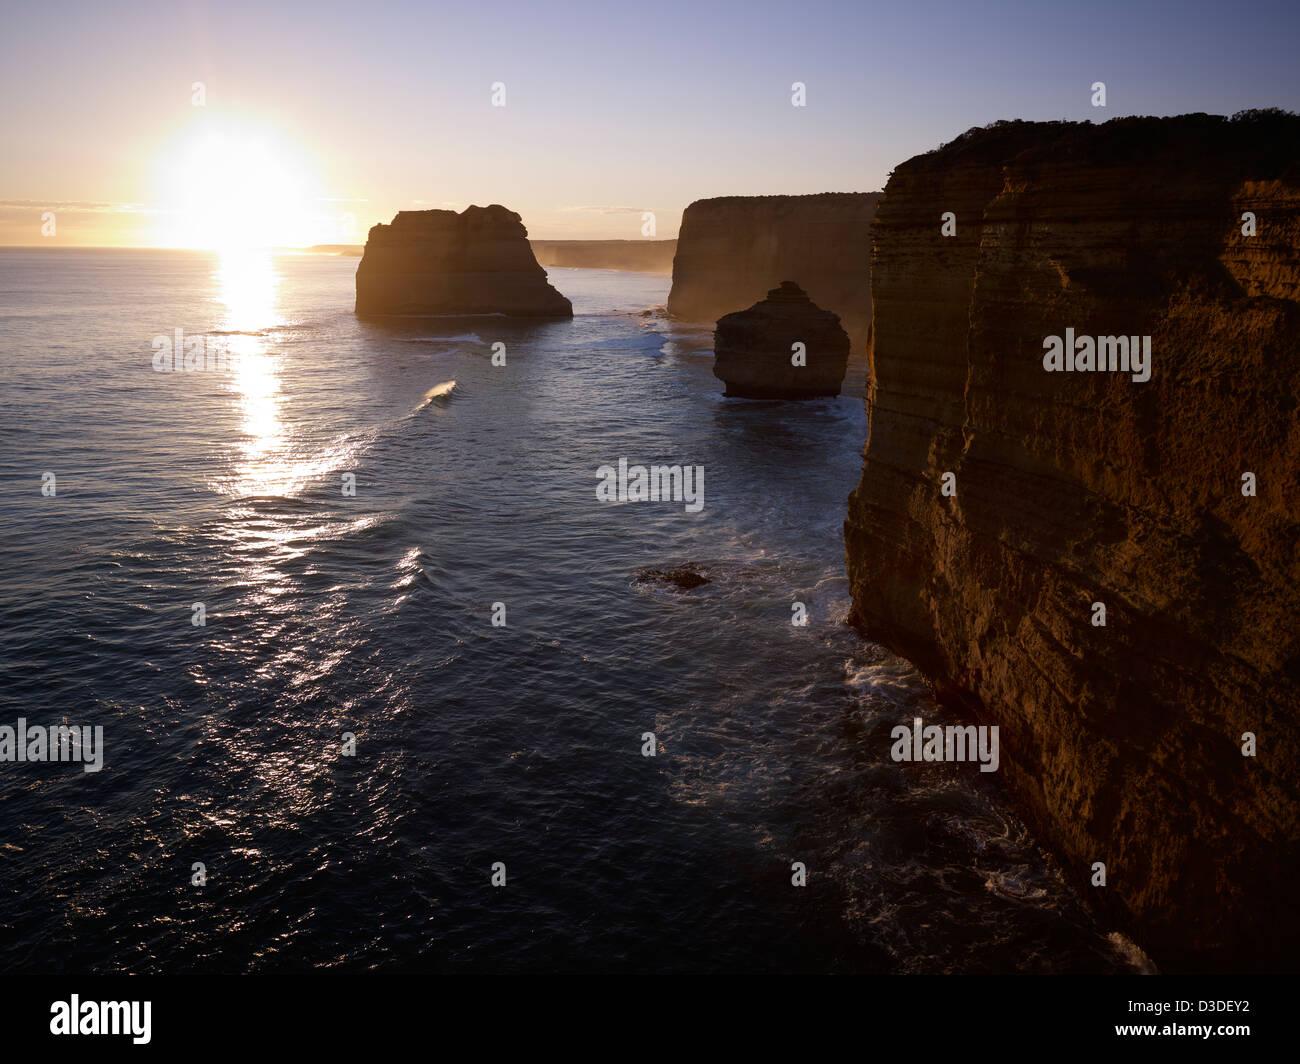 The famous Twelve Apostles on Victoria's Great Ocean Road Australia - Stock Image